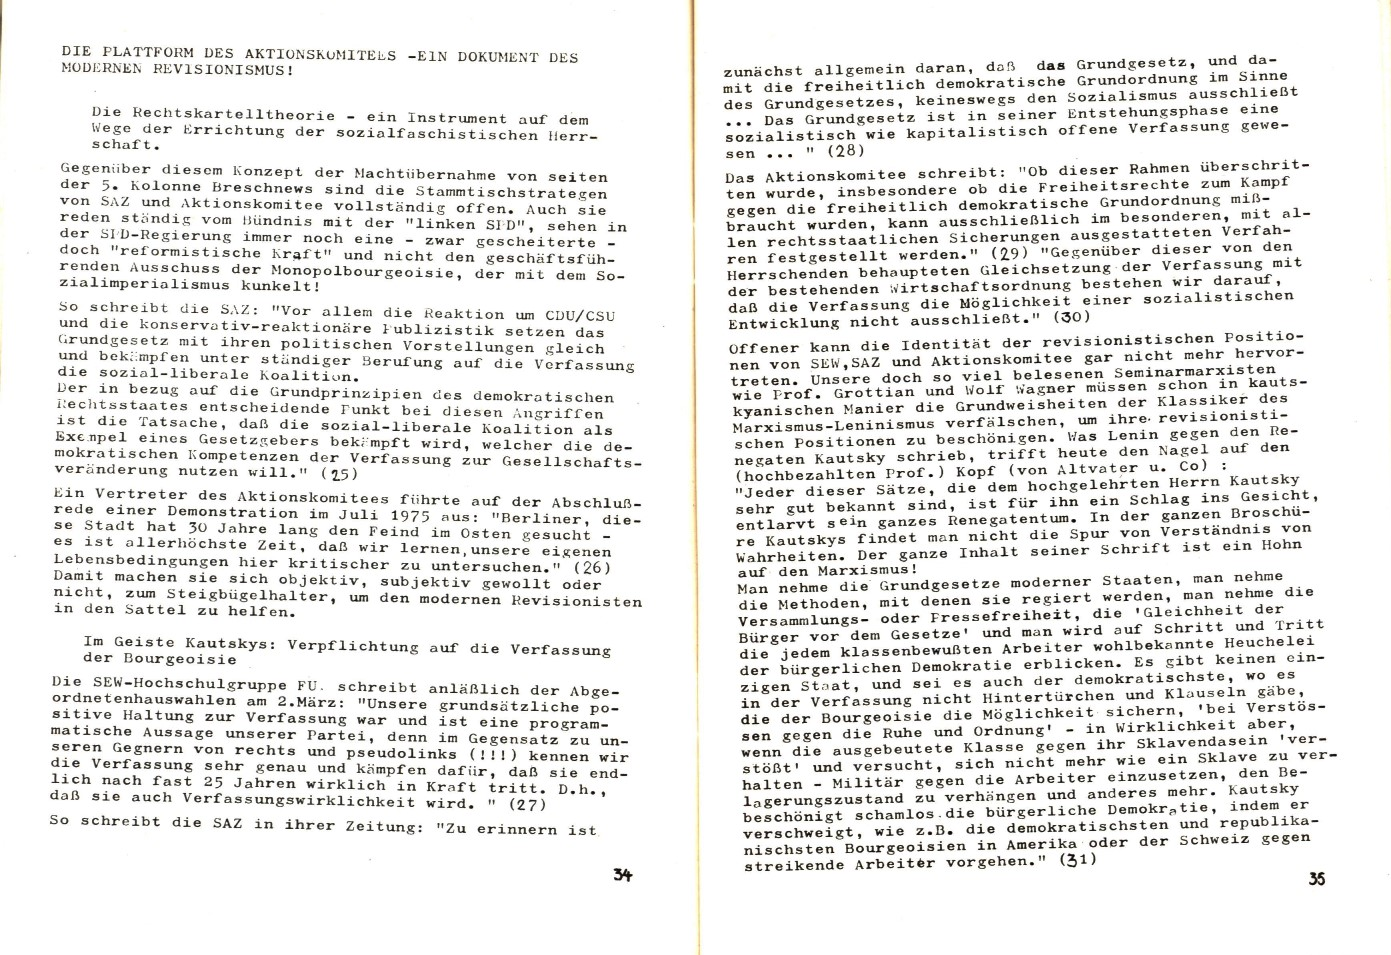 Berlin_KSV_1975_Dokumente_der_SAZ_19